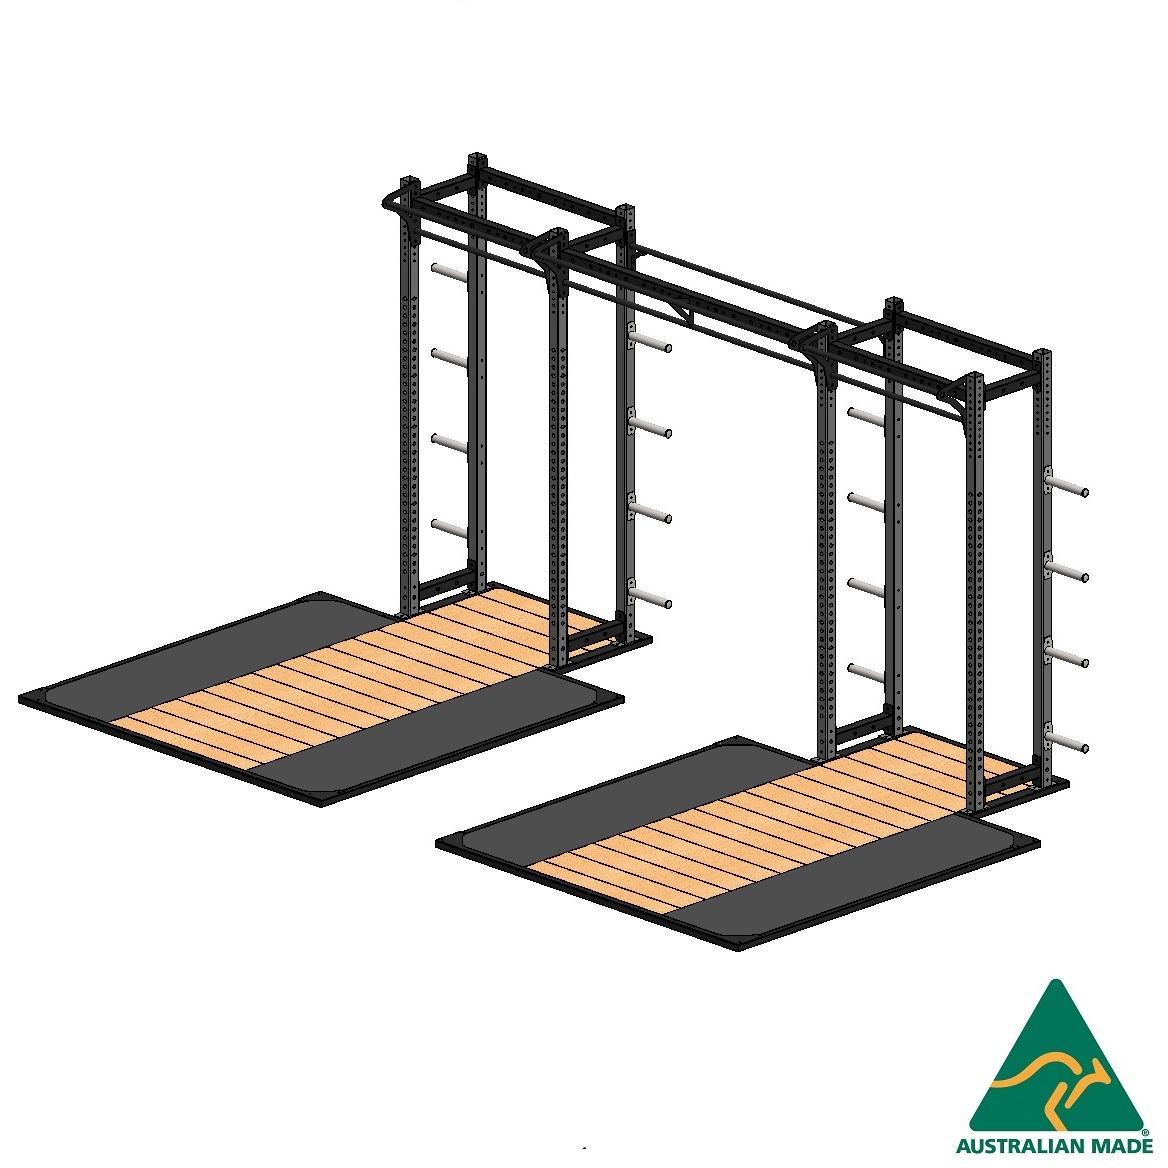 Cage half + plat 2.4x2.4m x 2